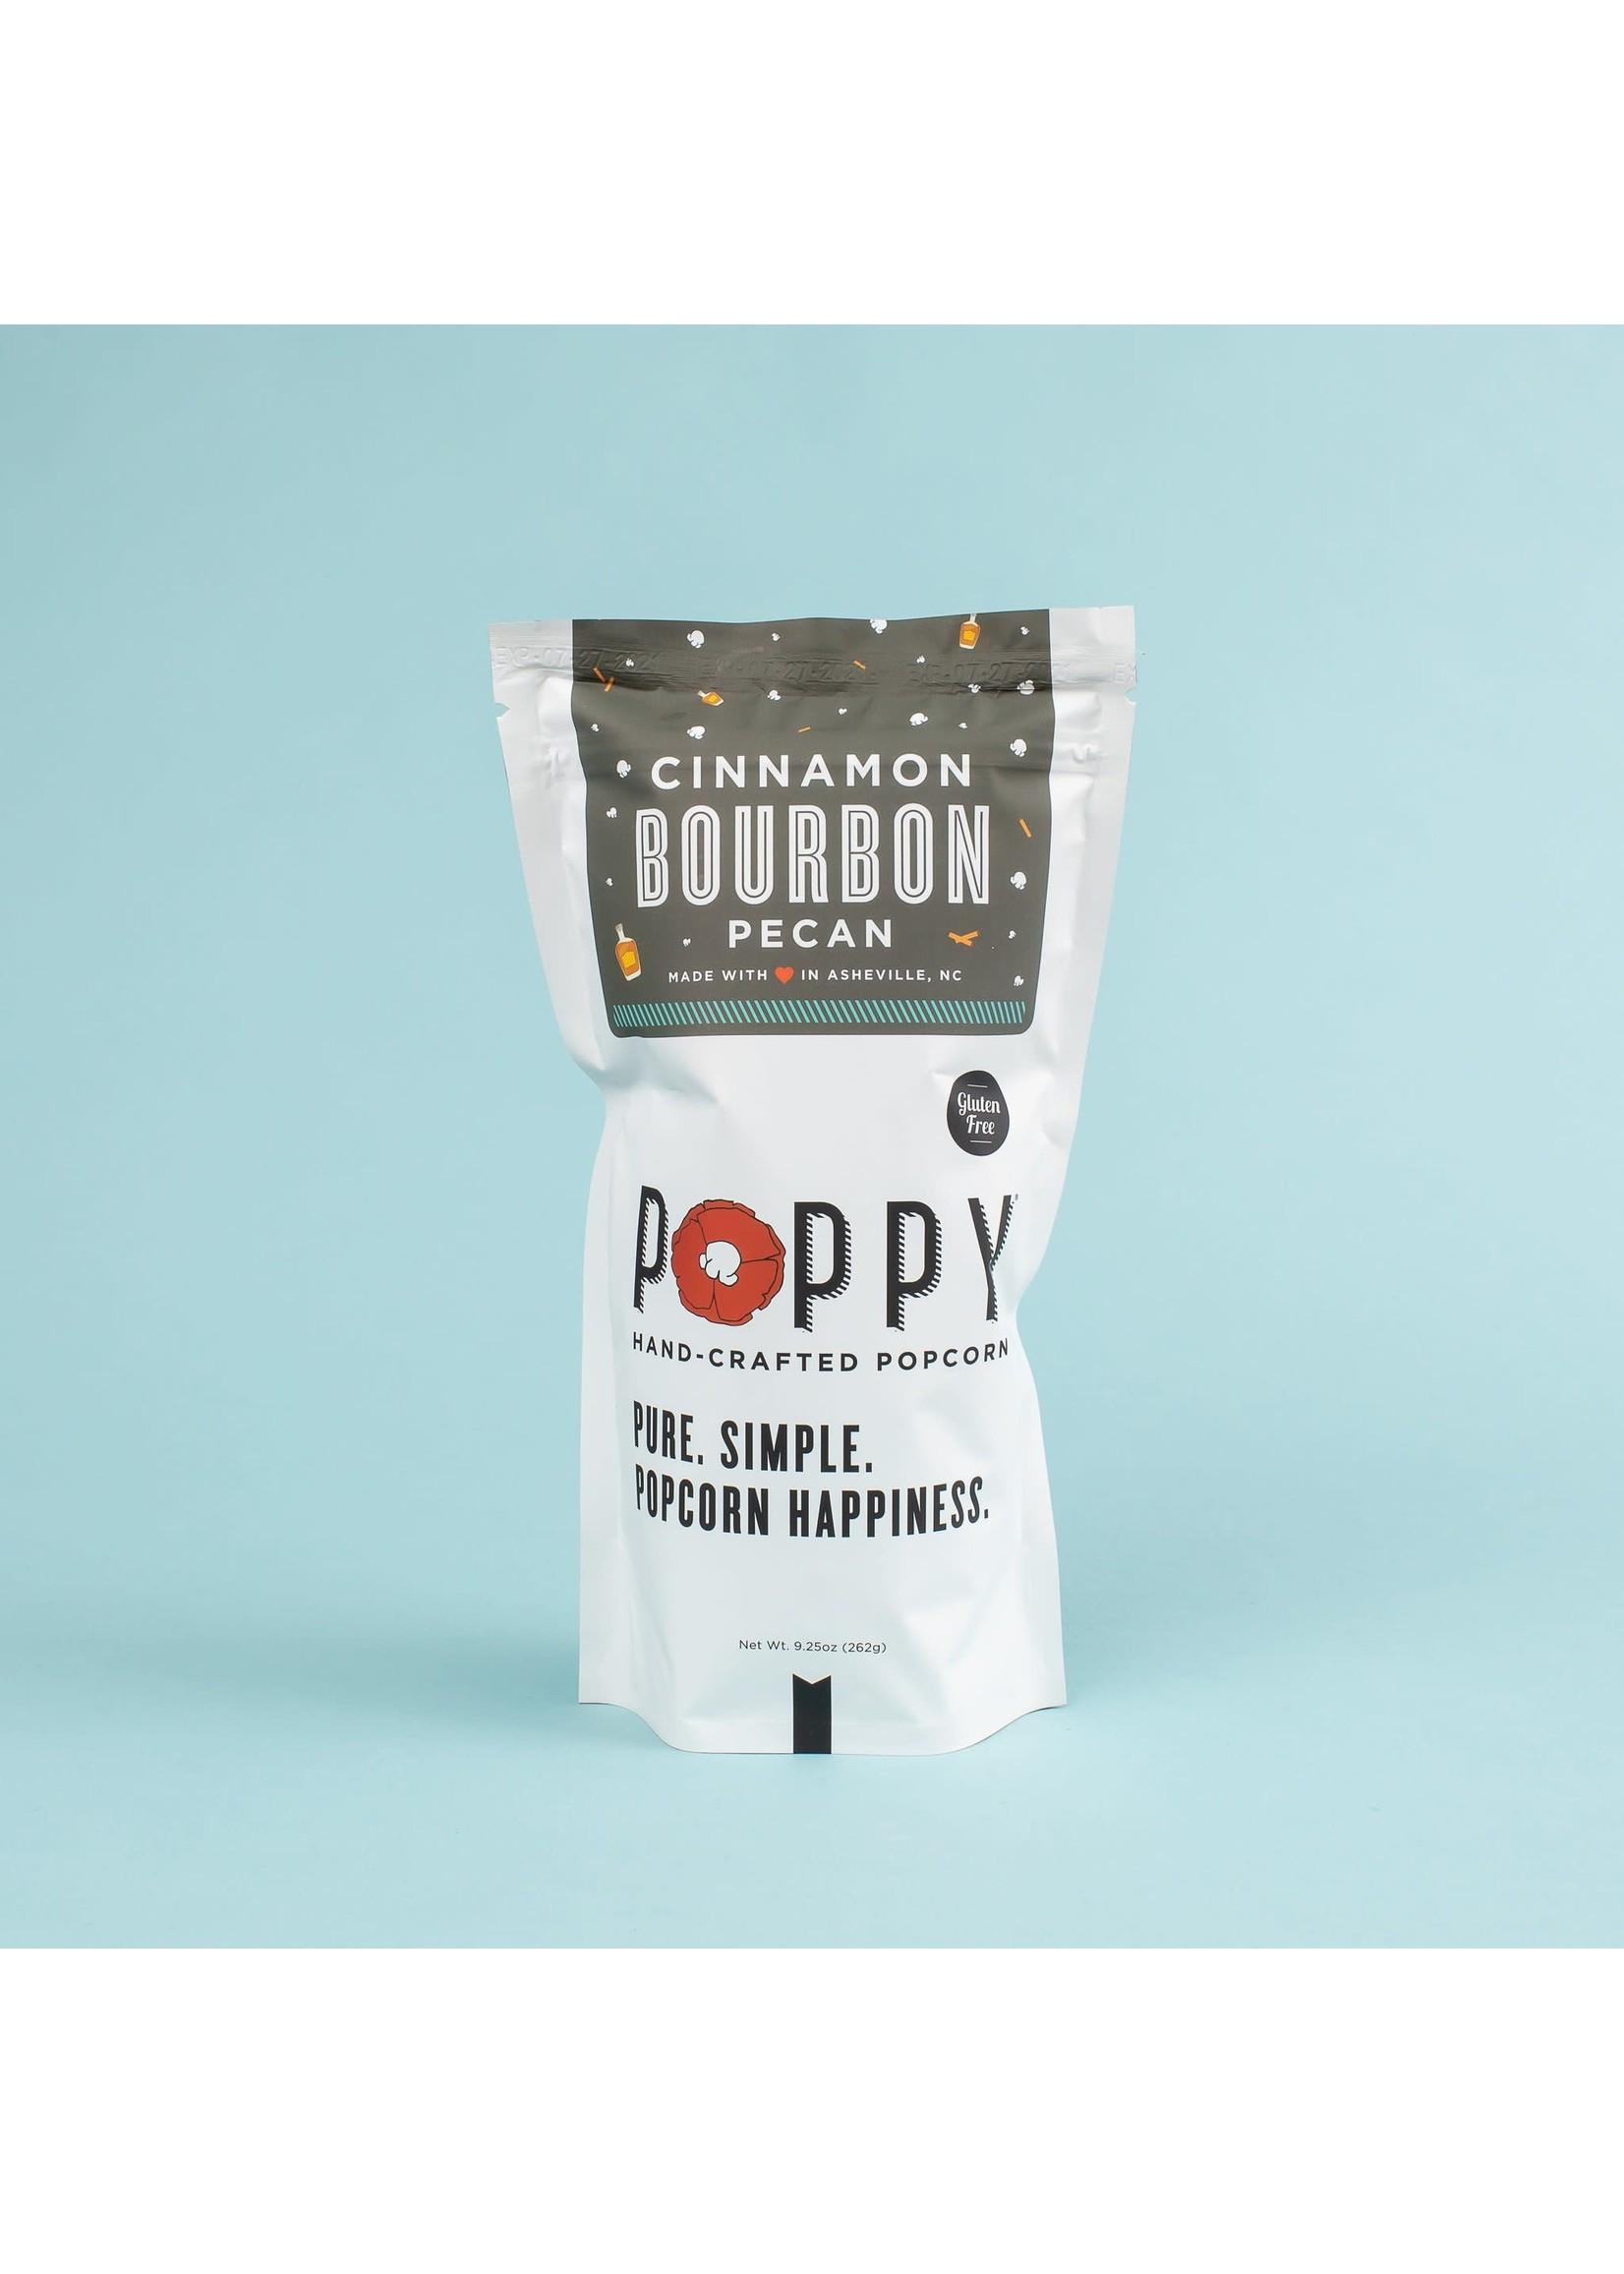 Poppy Handcrafted Popcorn Cinnamon Bourbon Pecan Popcorn